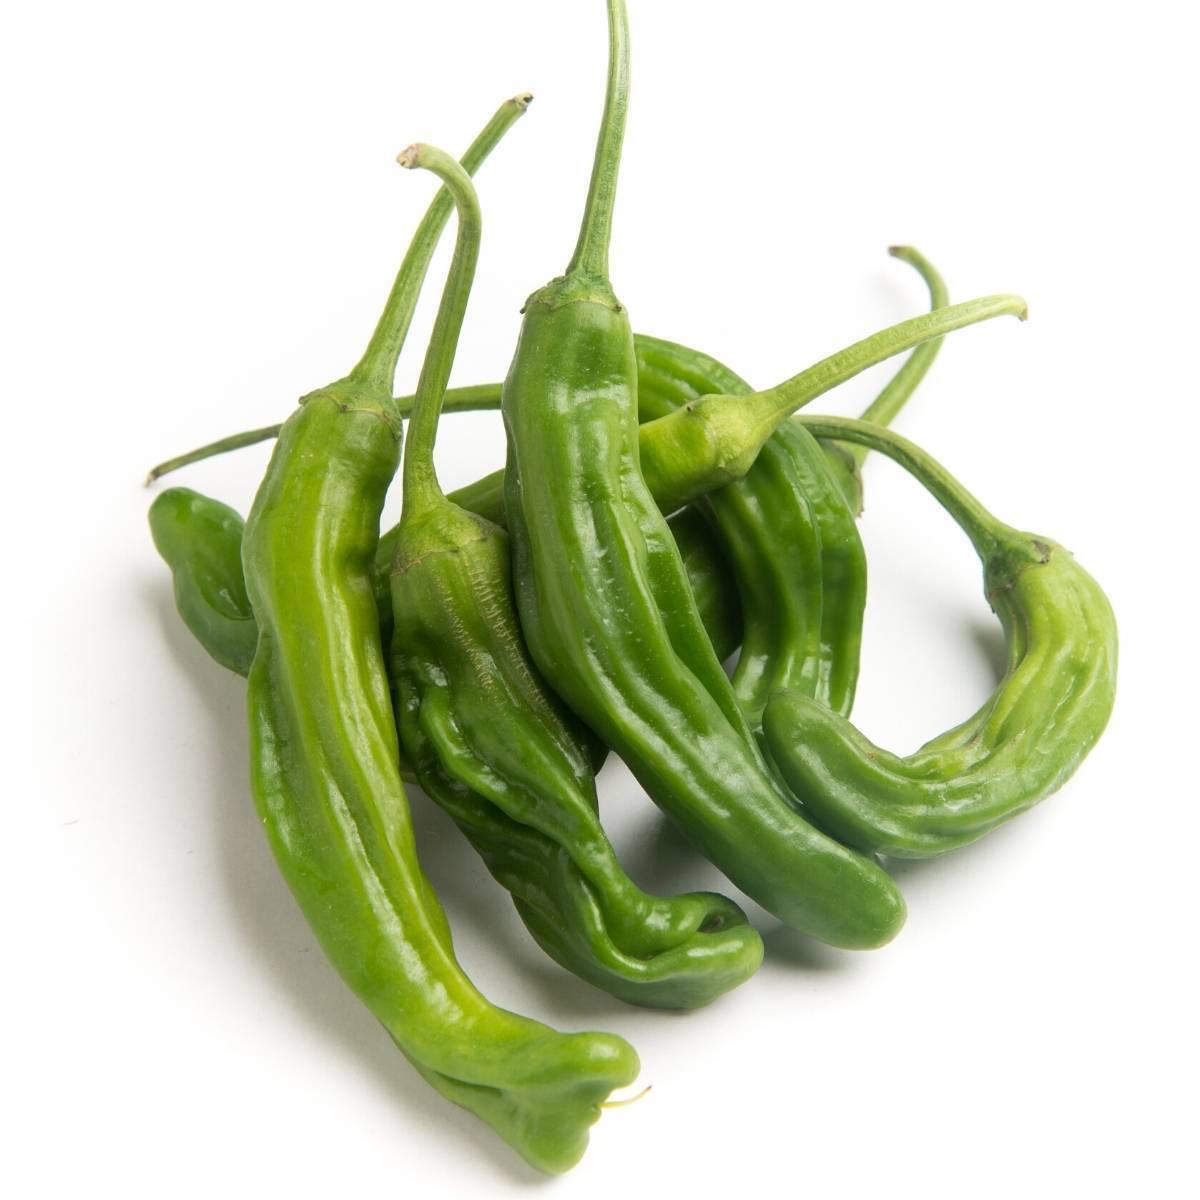 Shishito Peppers from Bodhitree Farm